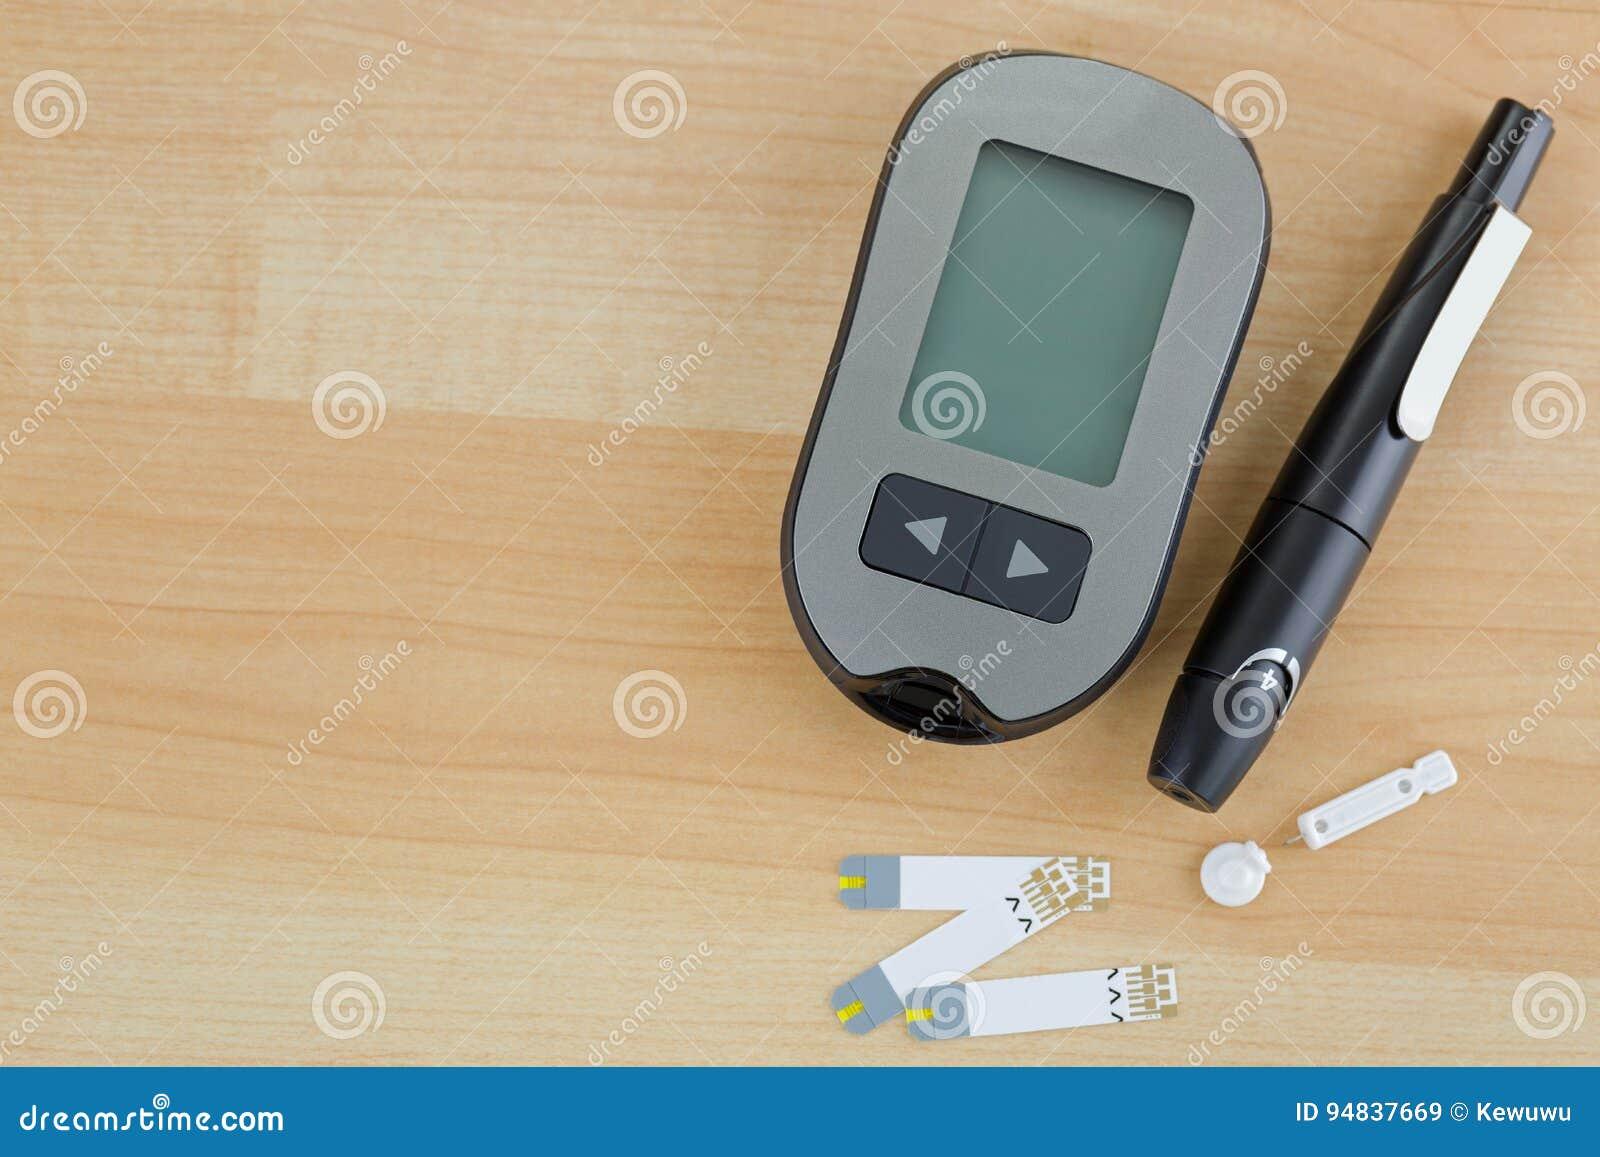 Blood Glucose Meter, Test Strip, Lancing Pen Device On